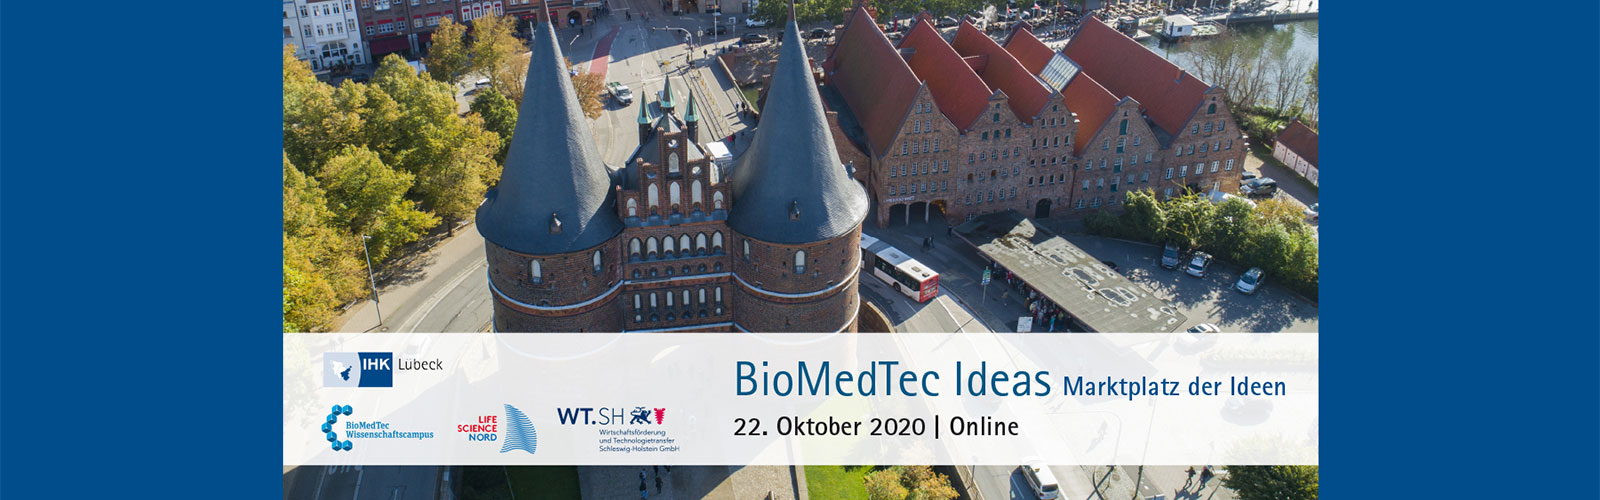 BioMedTec Ideas 2020 - Marktplatz der Ideen @ online